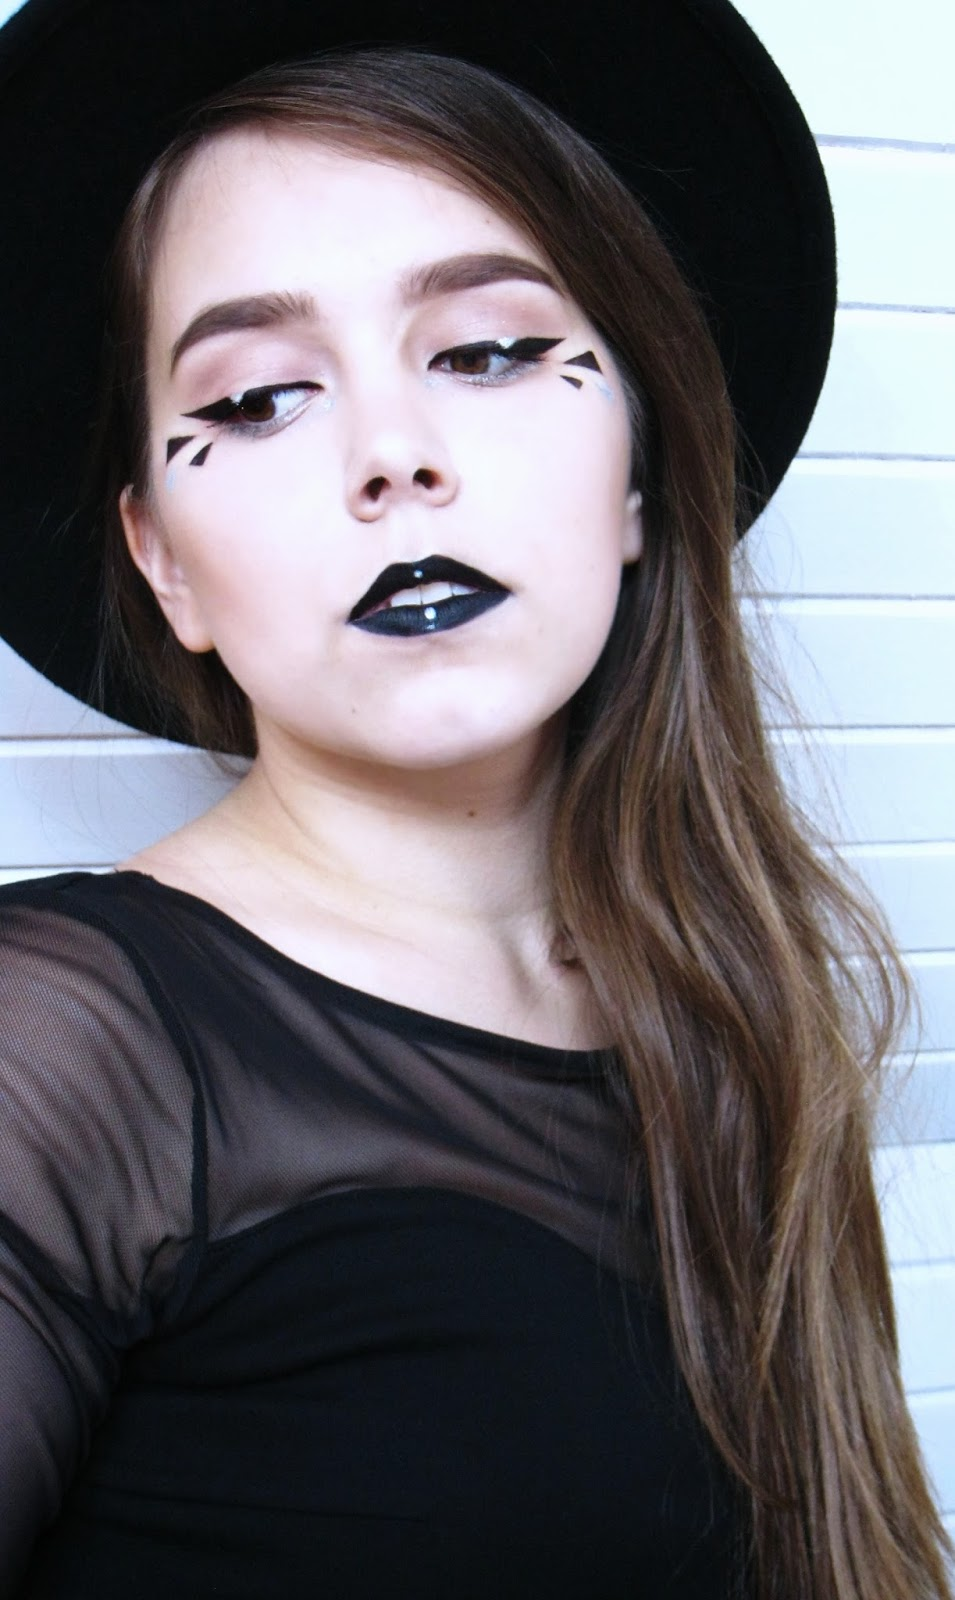 Graphic make-up, makijaż graficzny, black lips, czarne usta, h&m hat